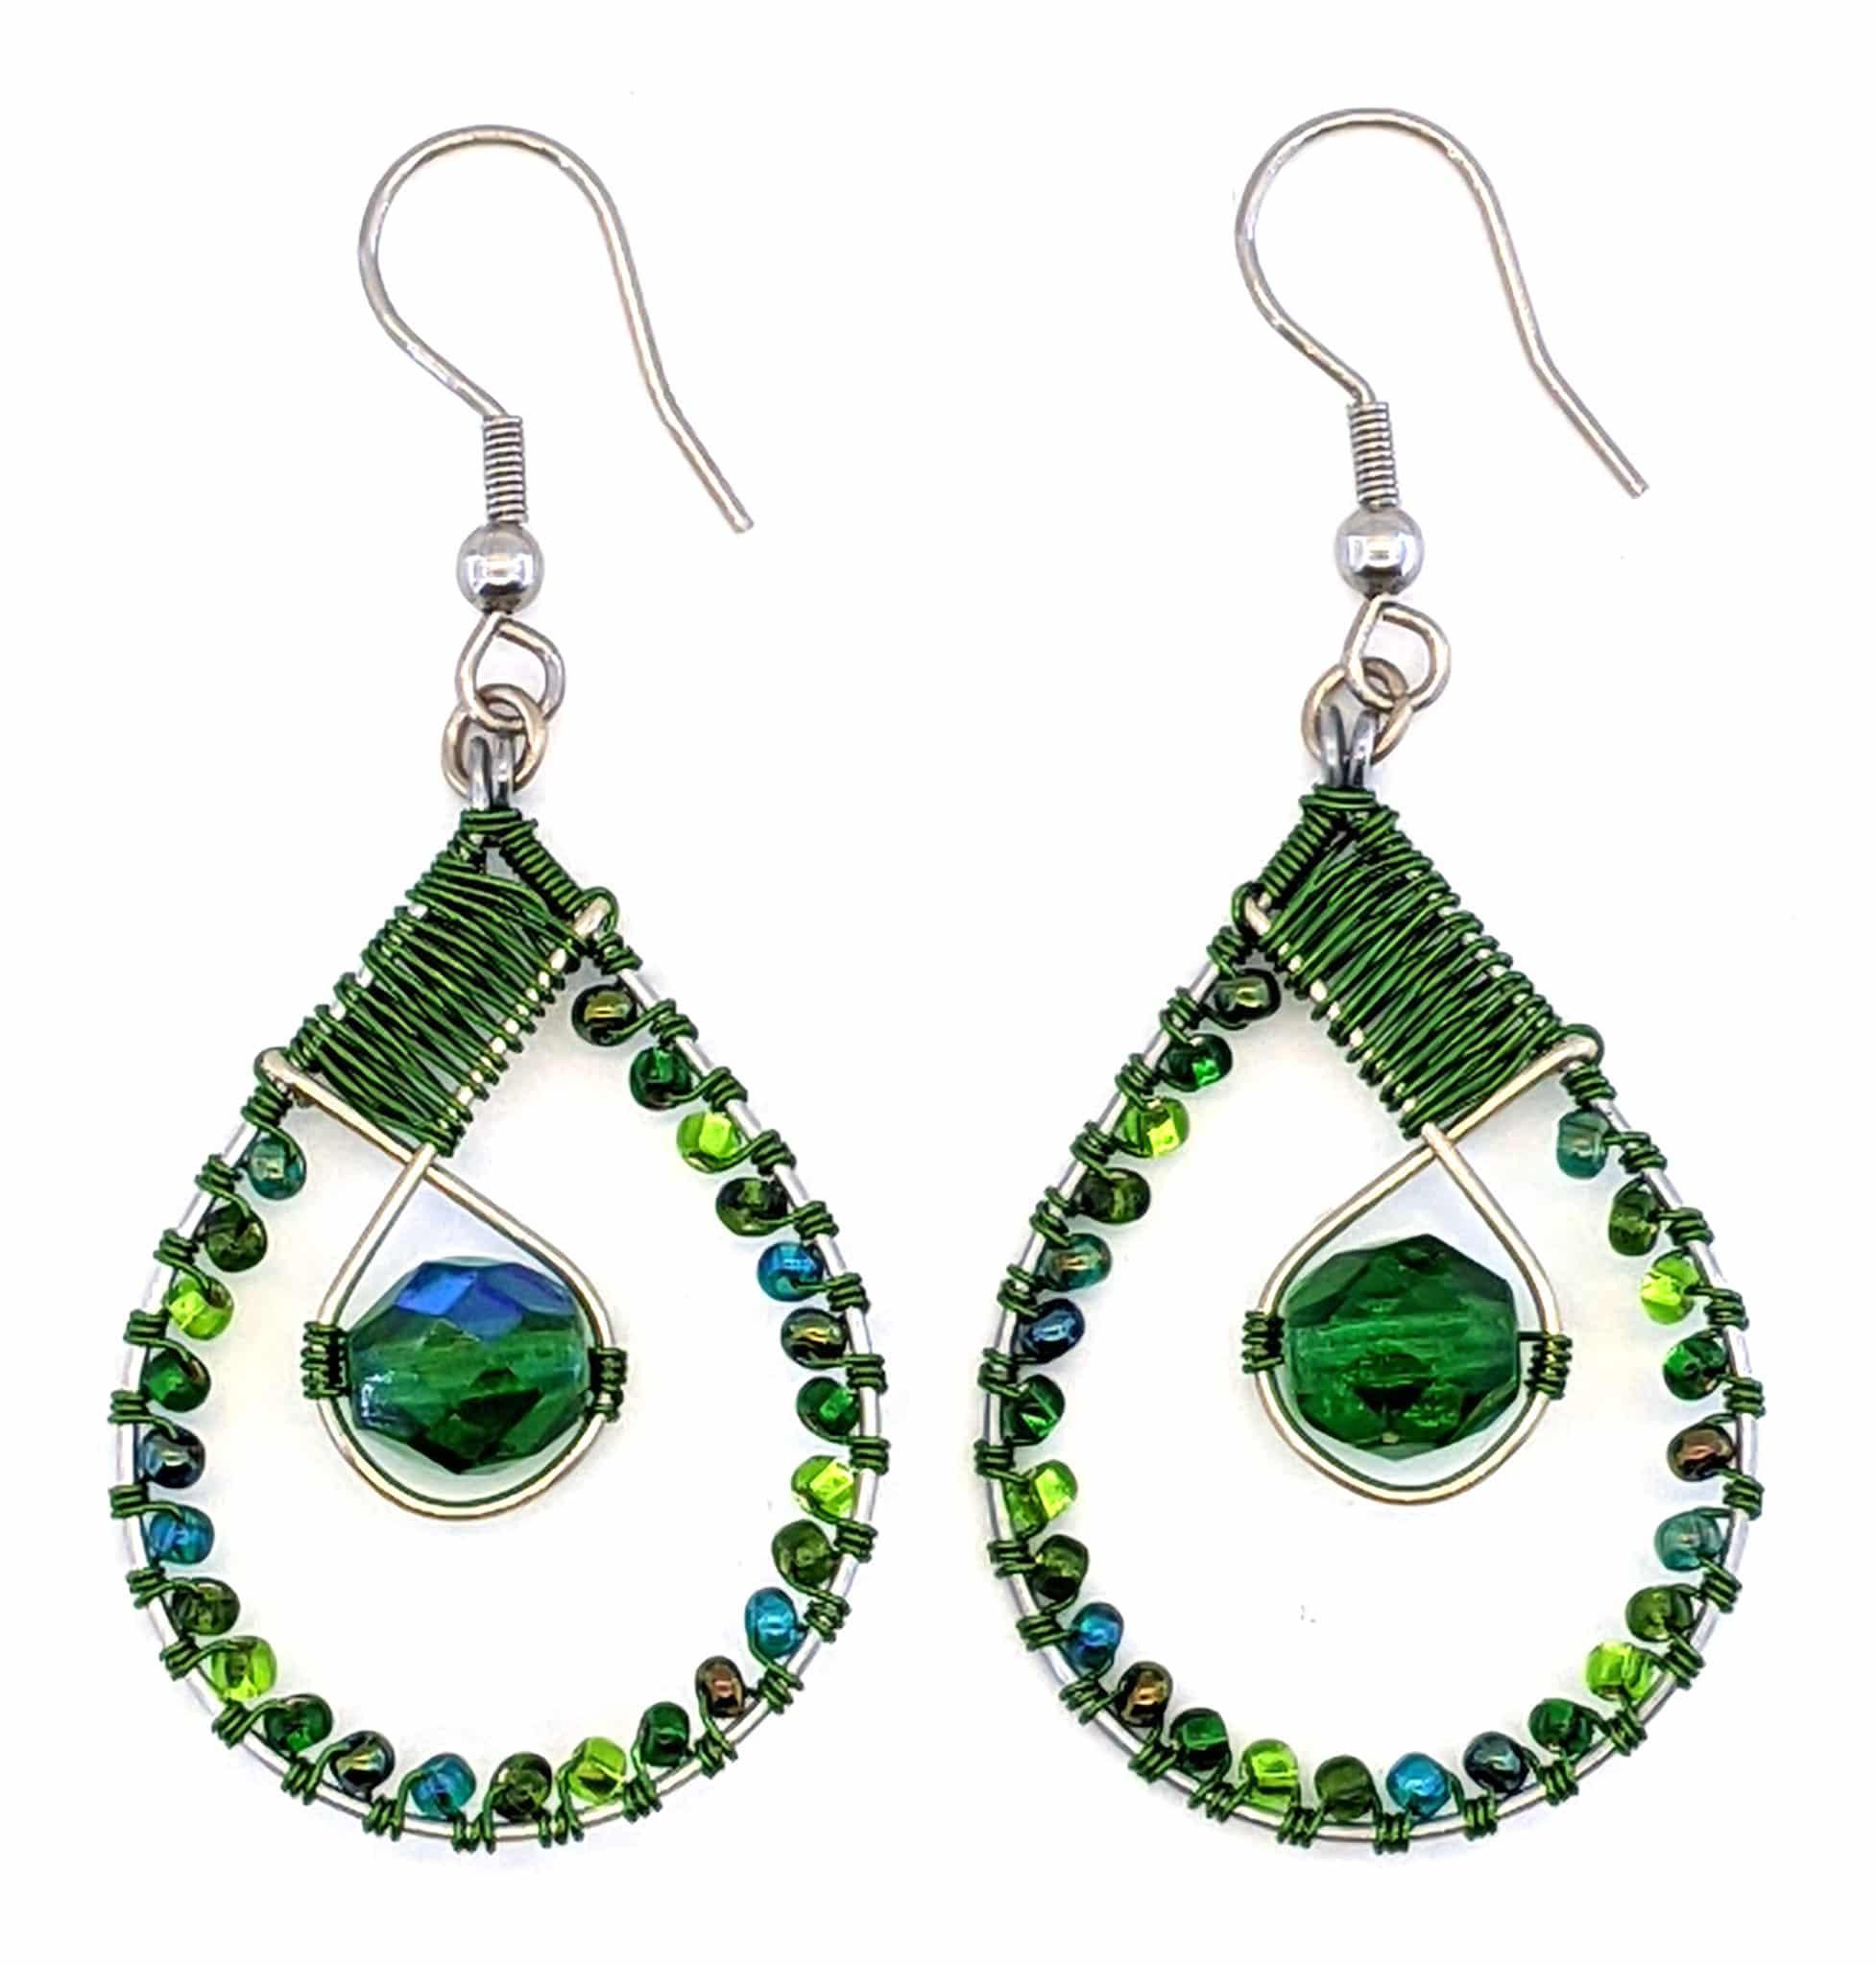 Teardrop with Crystal Beaded Earrings - Forest Greens